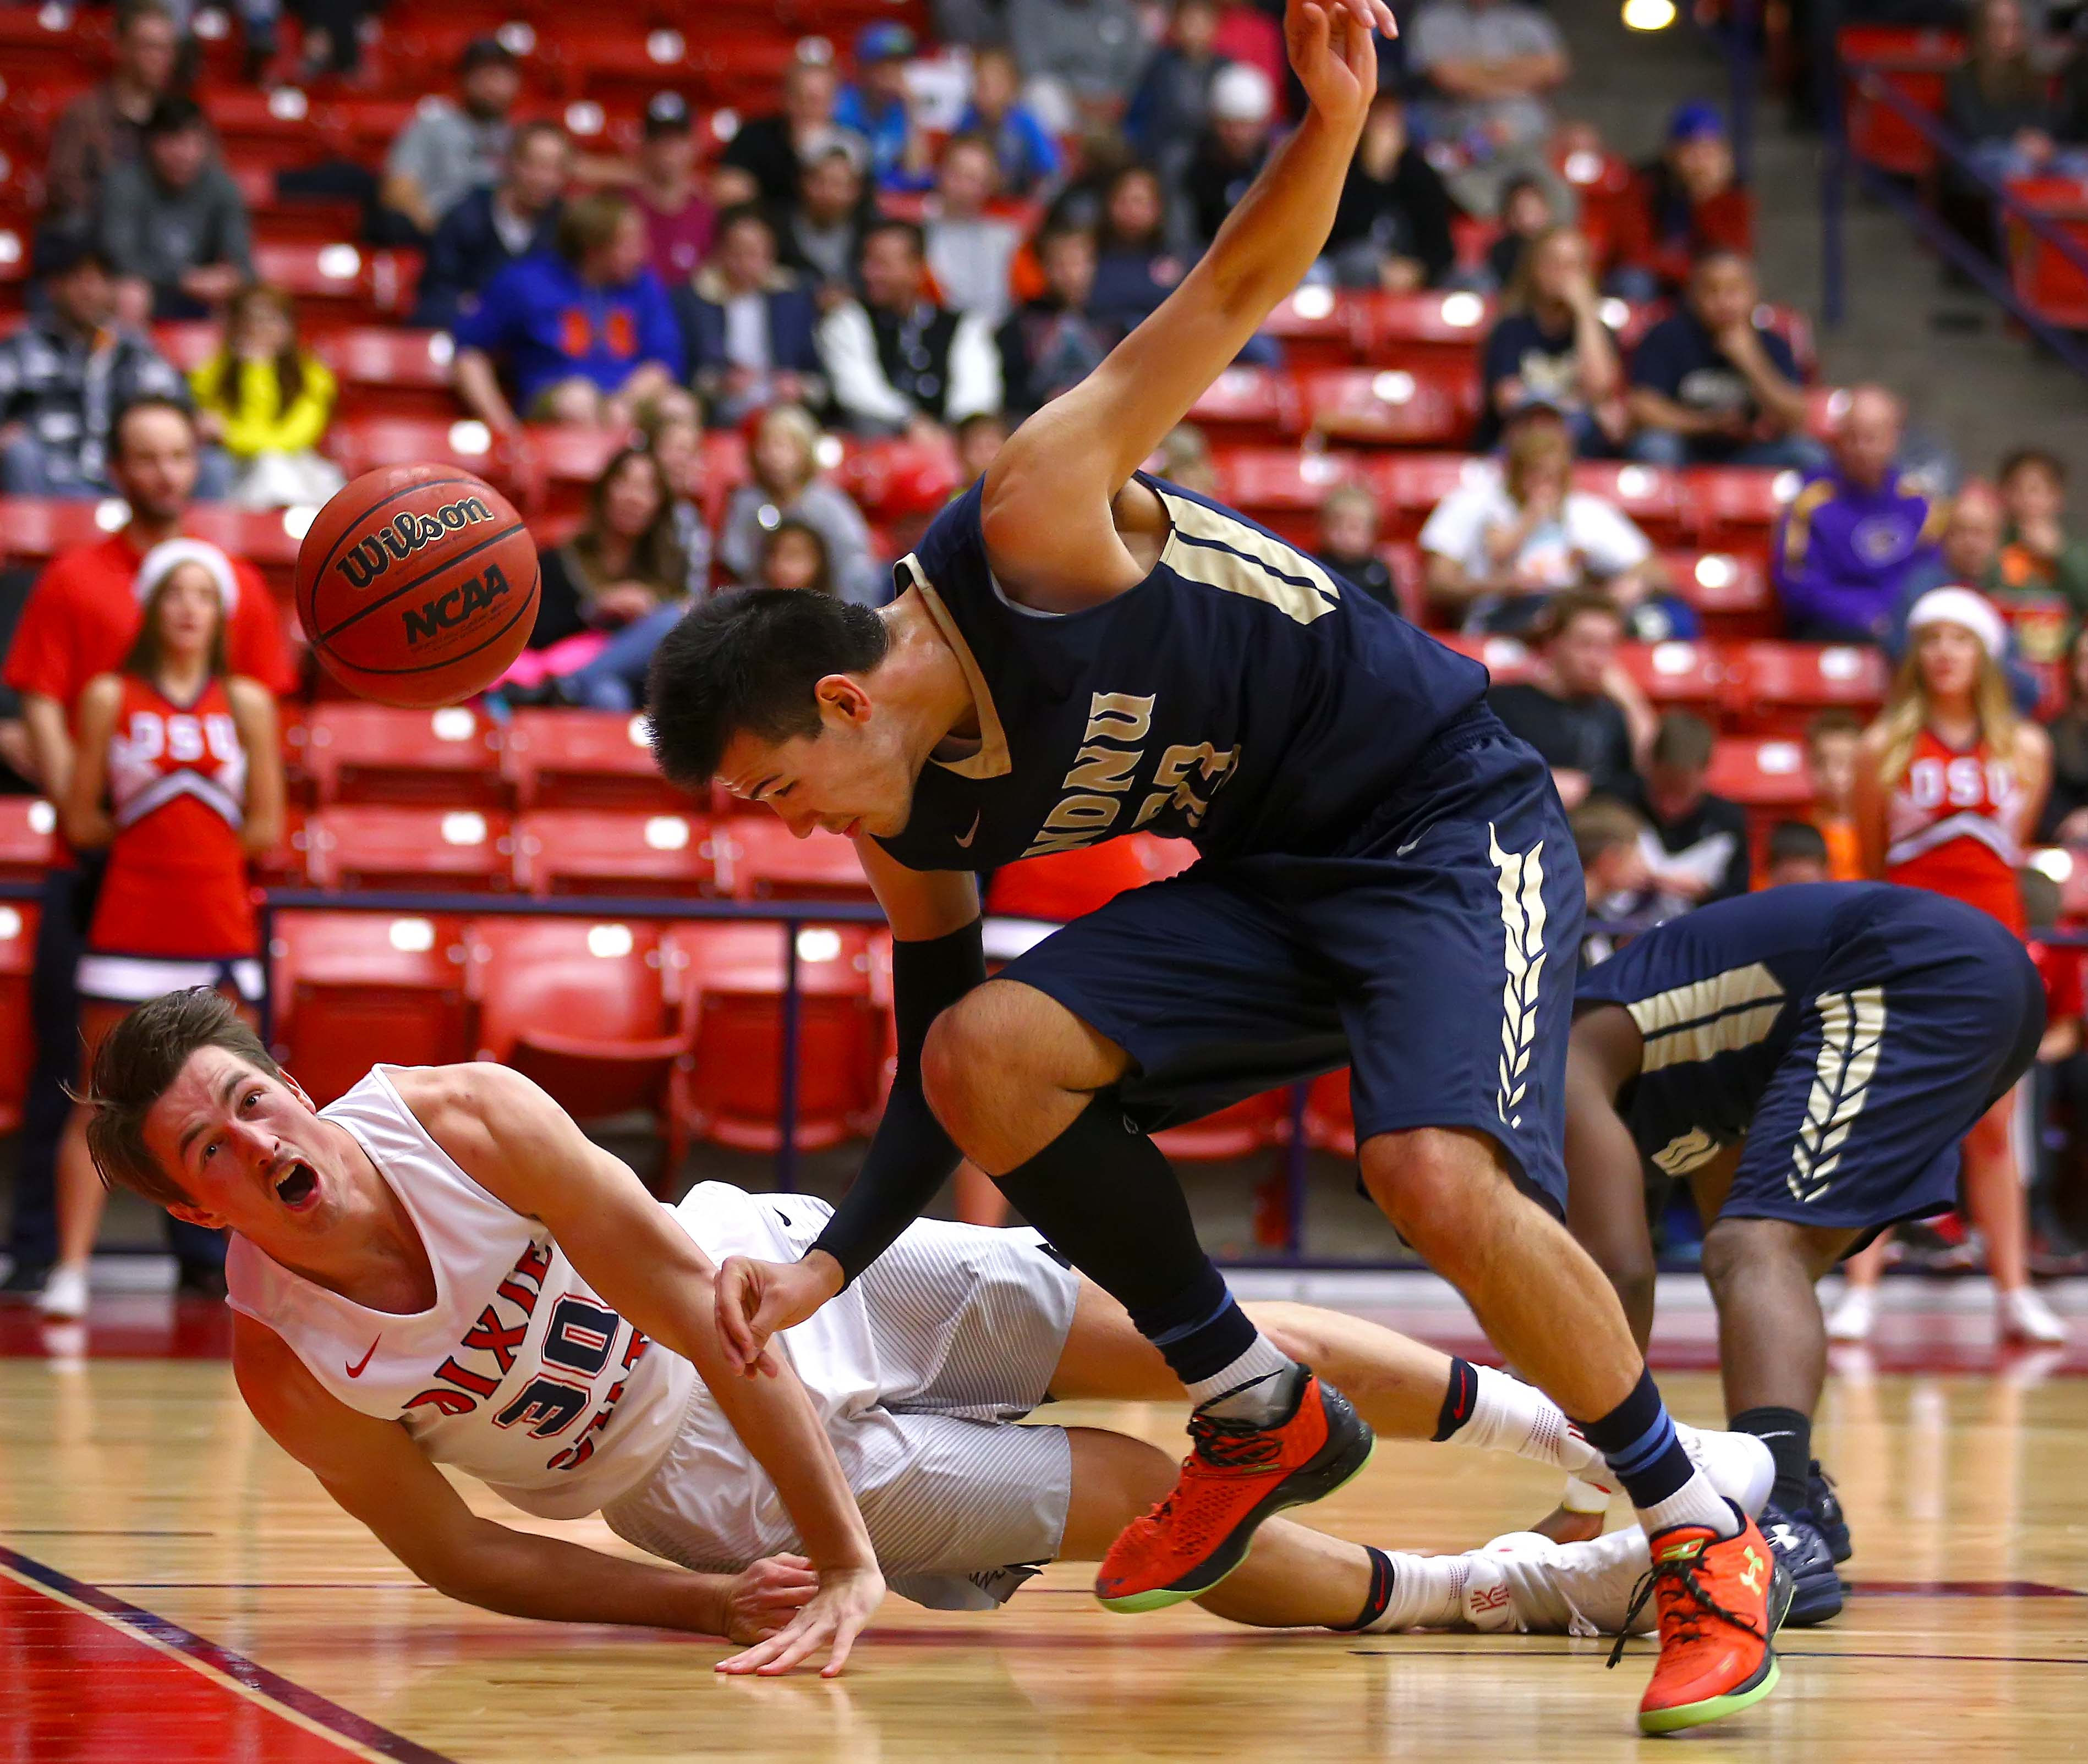 Dixie State's Dub Price (30), Dixie State University vs. Notre Dame de Namur University, Men's Basketball, St. George, Utah, Dec. 17, 2016, | Photo by Robert Hoppie, ASPpix.com, St. George News